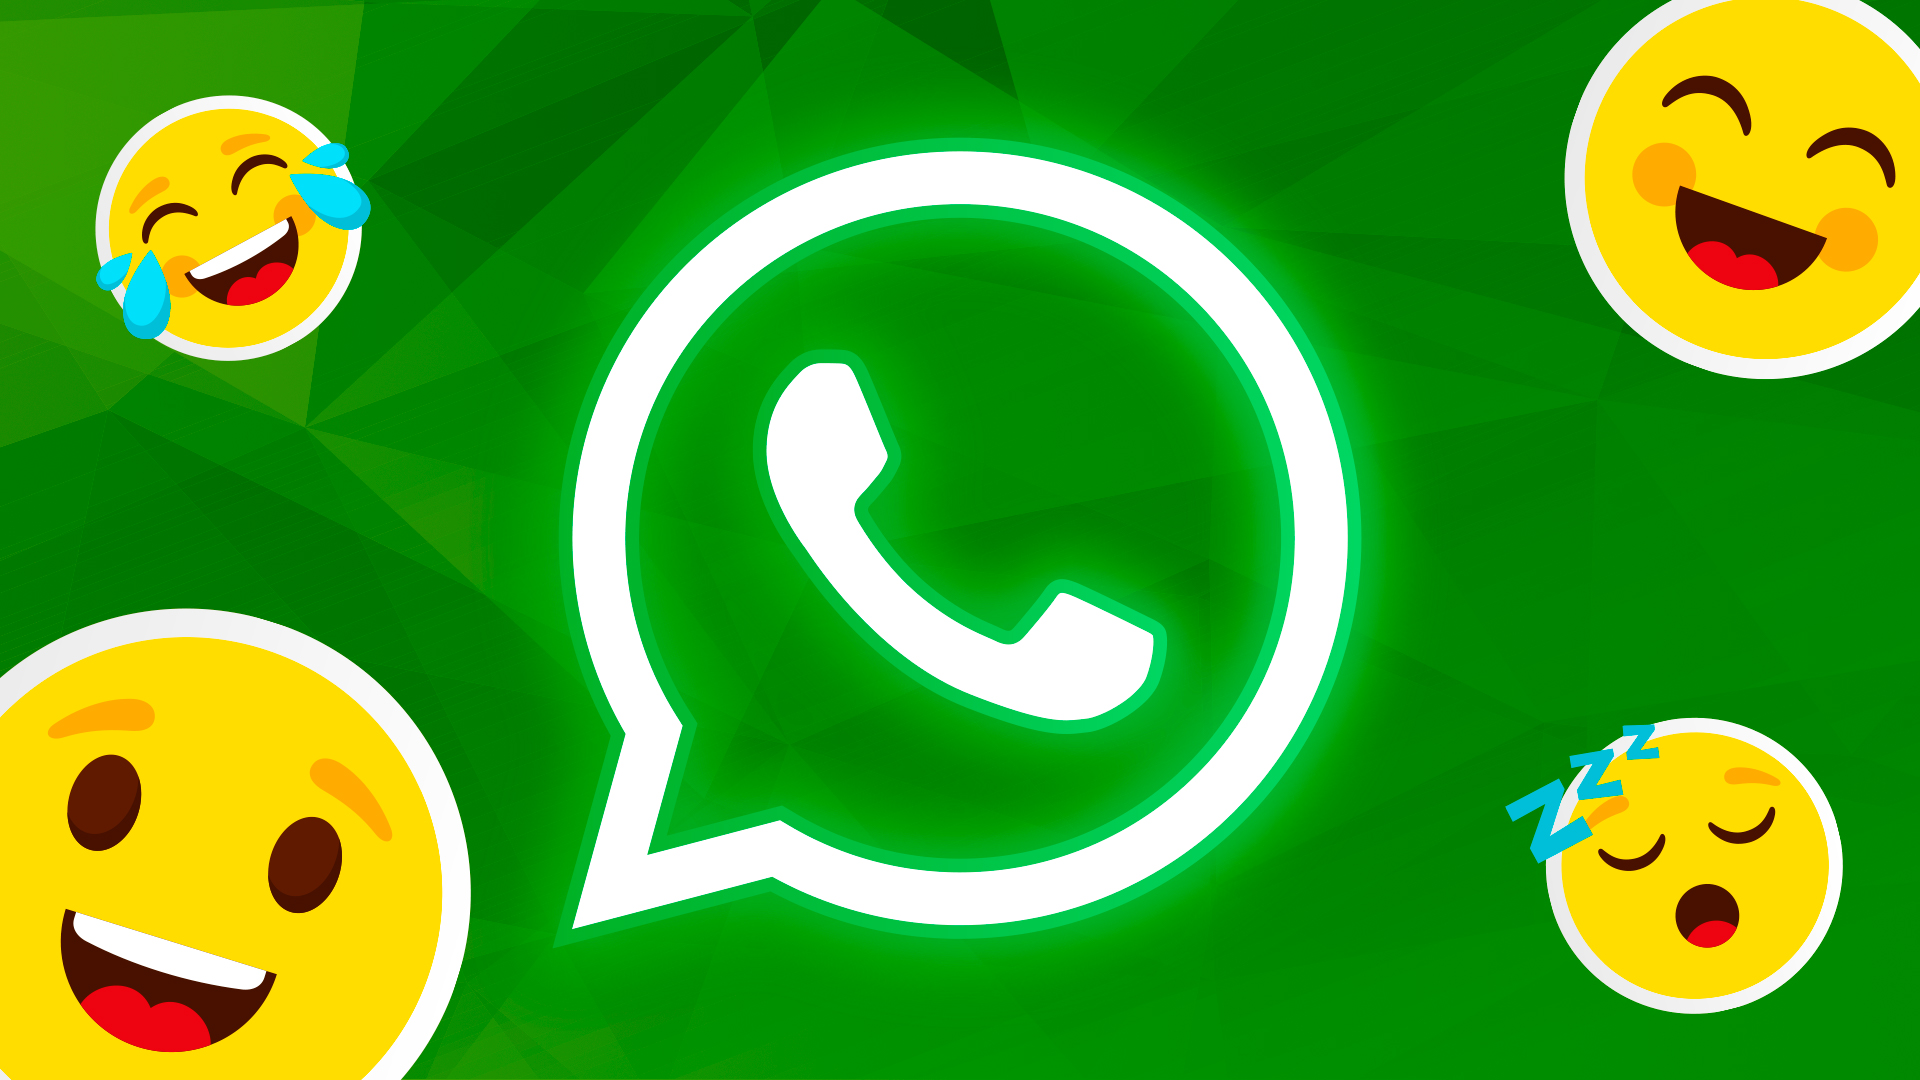 Messenger, whatsapp, Instant Messaging, Emoji, Emojis, Smiley, WhatsApp Logo, Smilies